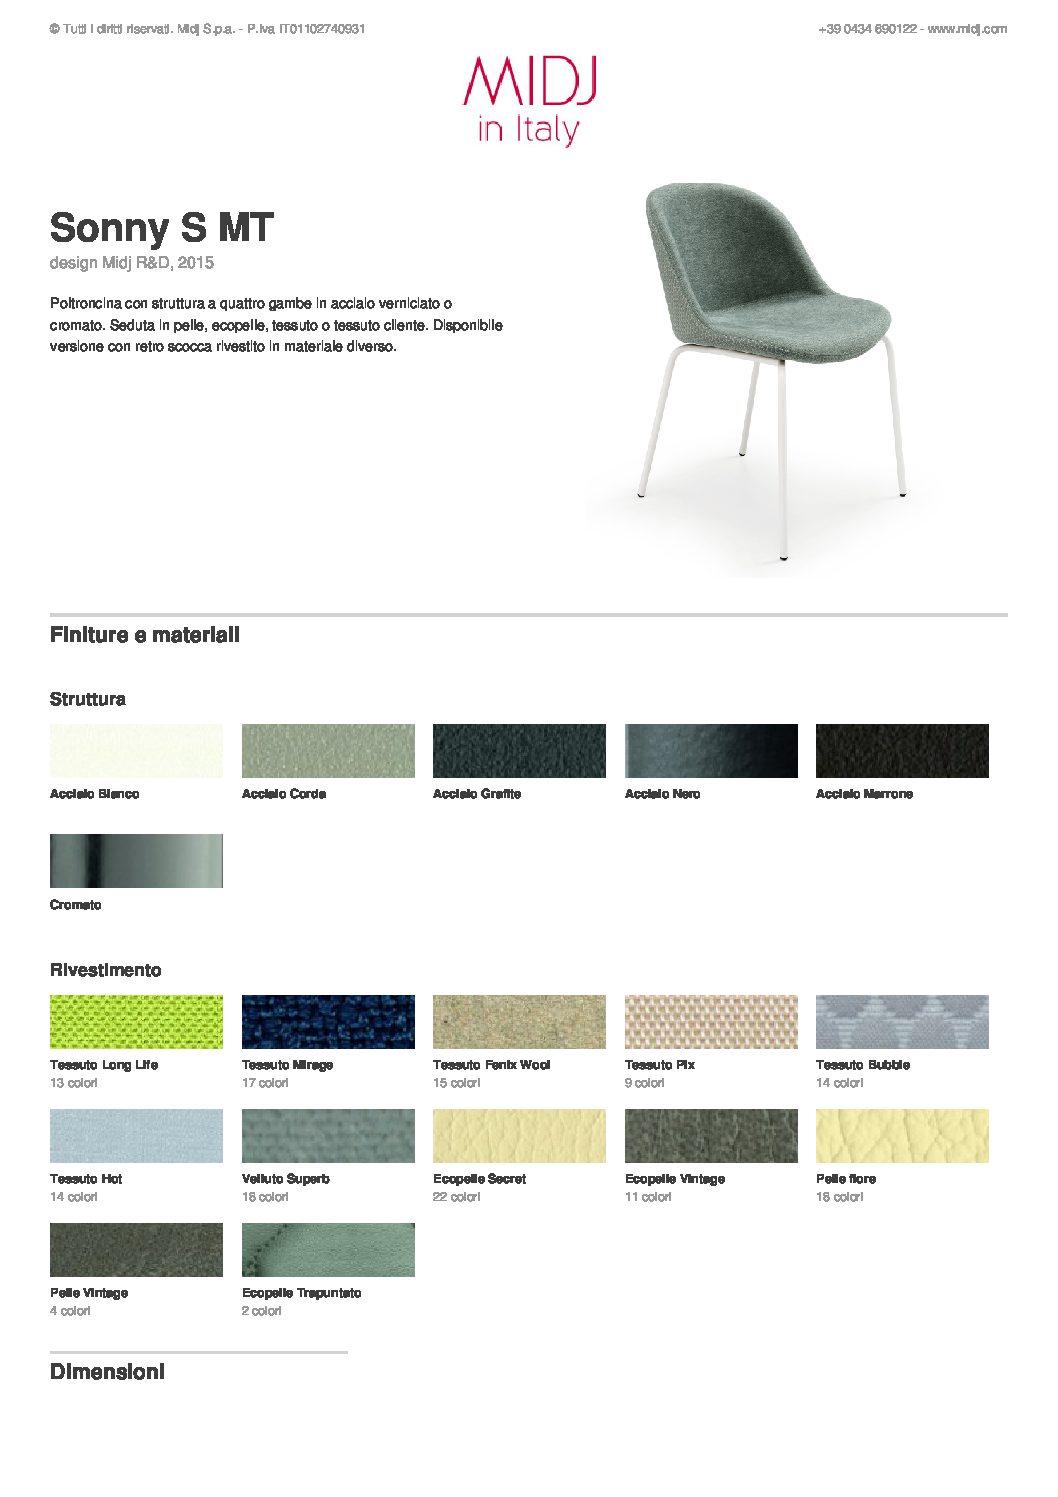 531a4a5eb Sonny S MT Chair - Midj - Gruppo Inventa Furniture Malta - Made in ...